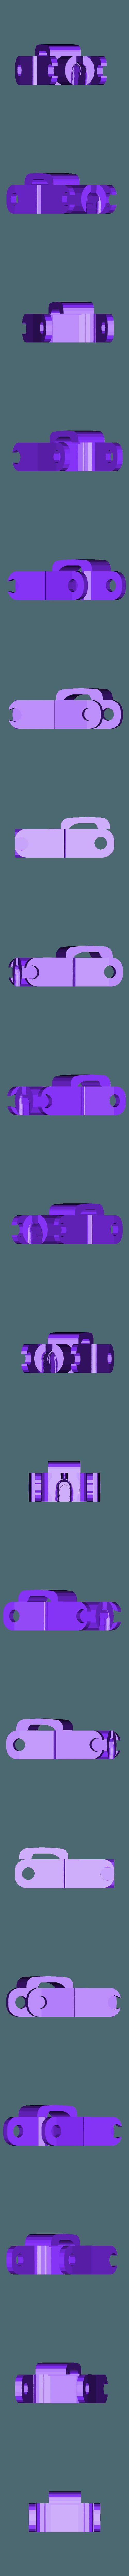 playmobil_desmontable_darth_vader_2.stl Download free STL file Darth Vader Playmobil • 3D printable object, madsoul666